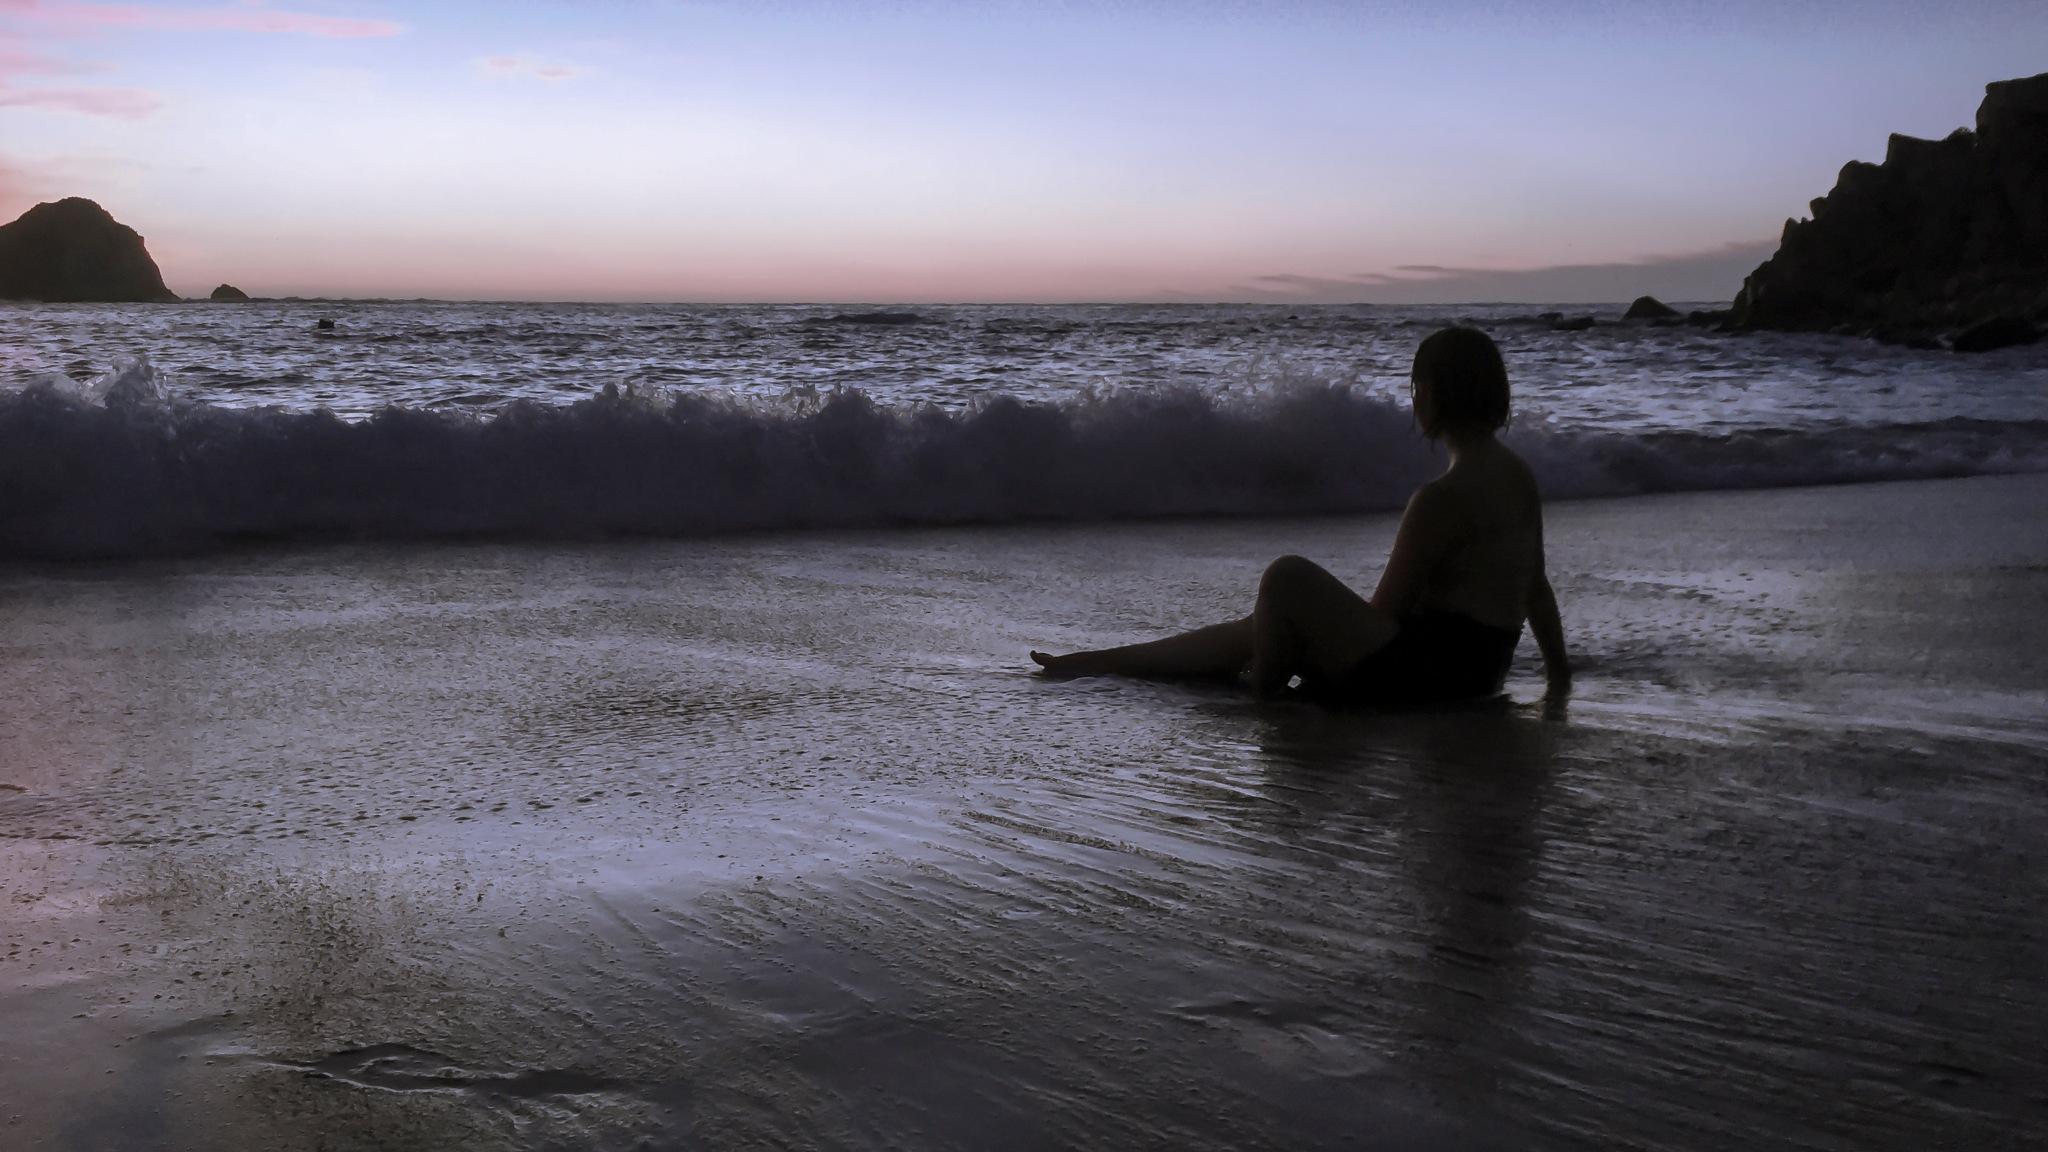 Sunset at the beach by Sebastian Mancilla